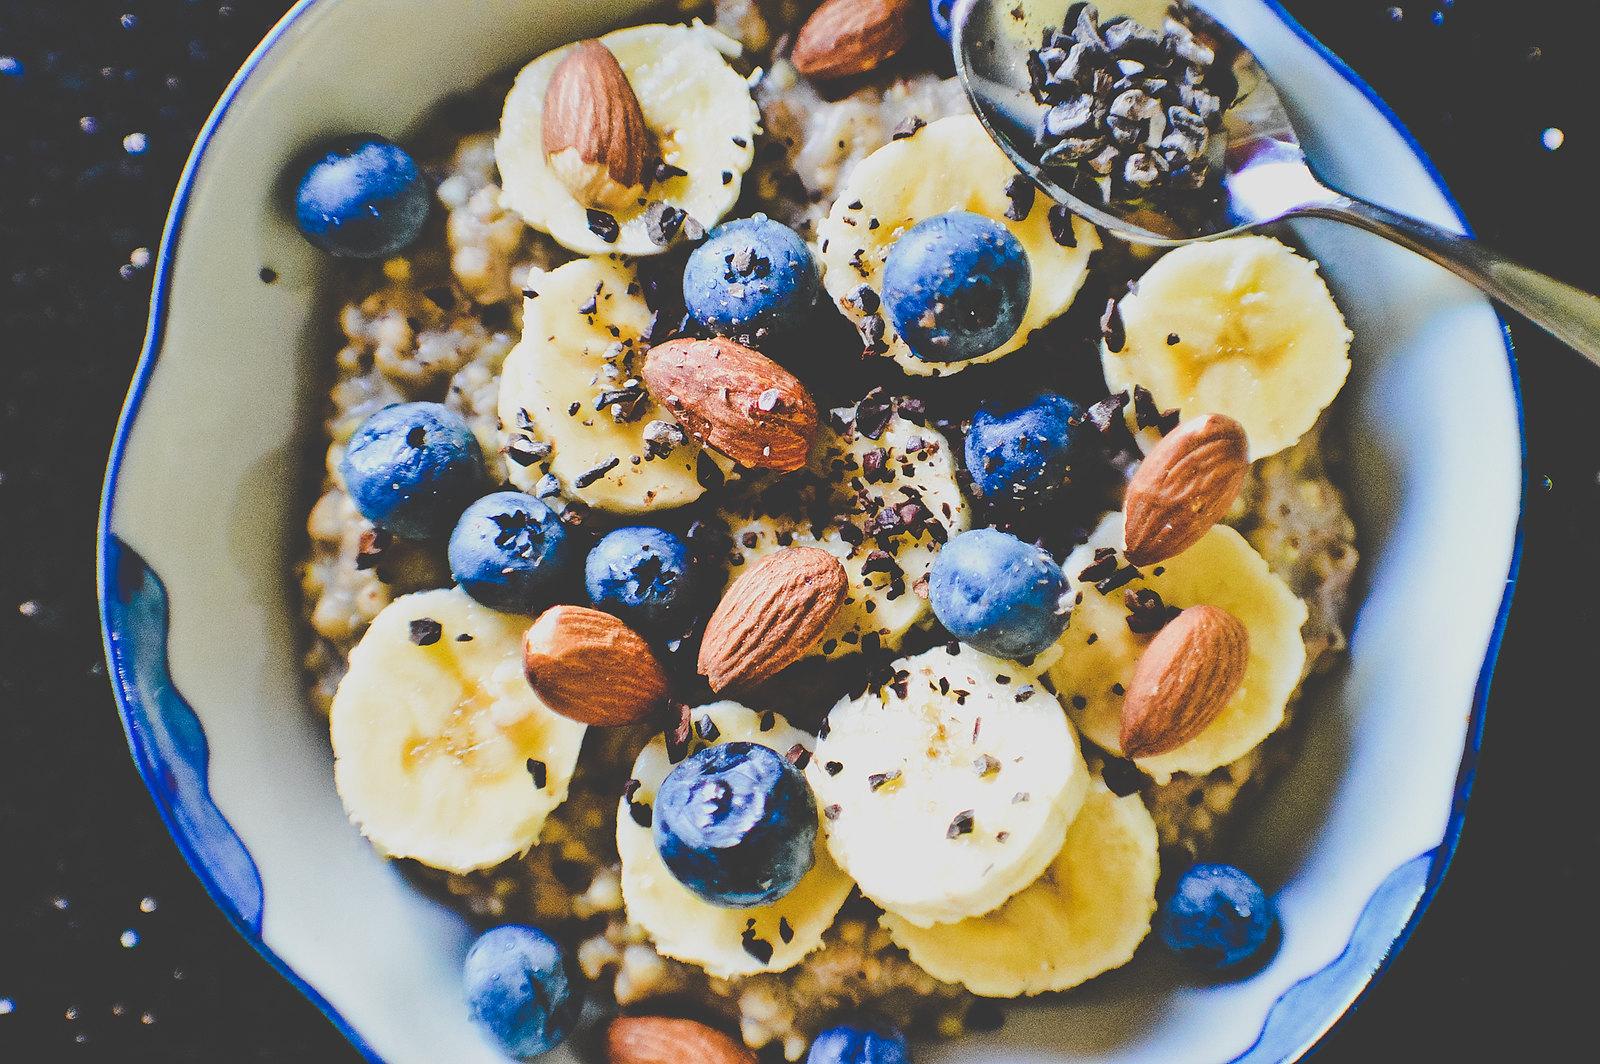 Creamy Banana Buckwheat Porridge with Blueberries, Almonds & Cacao Nibs